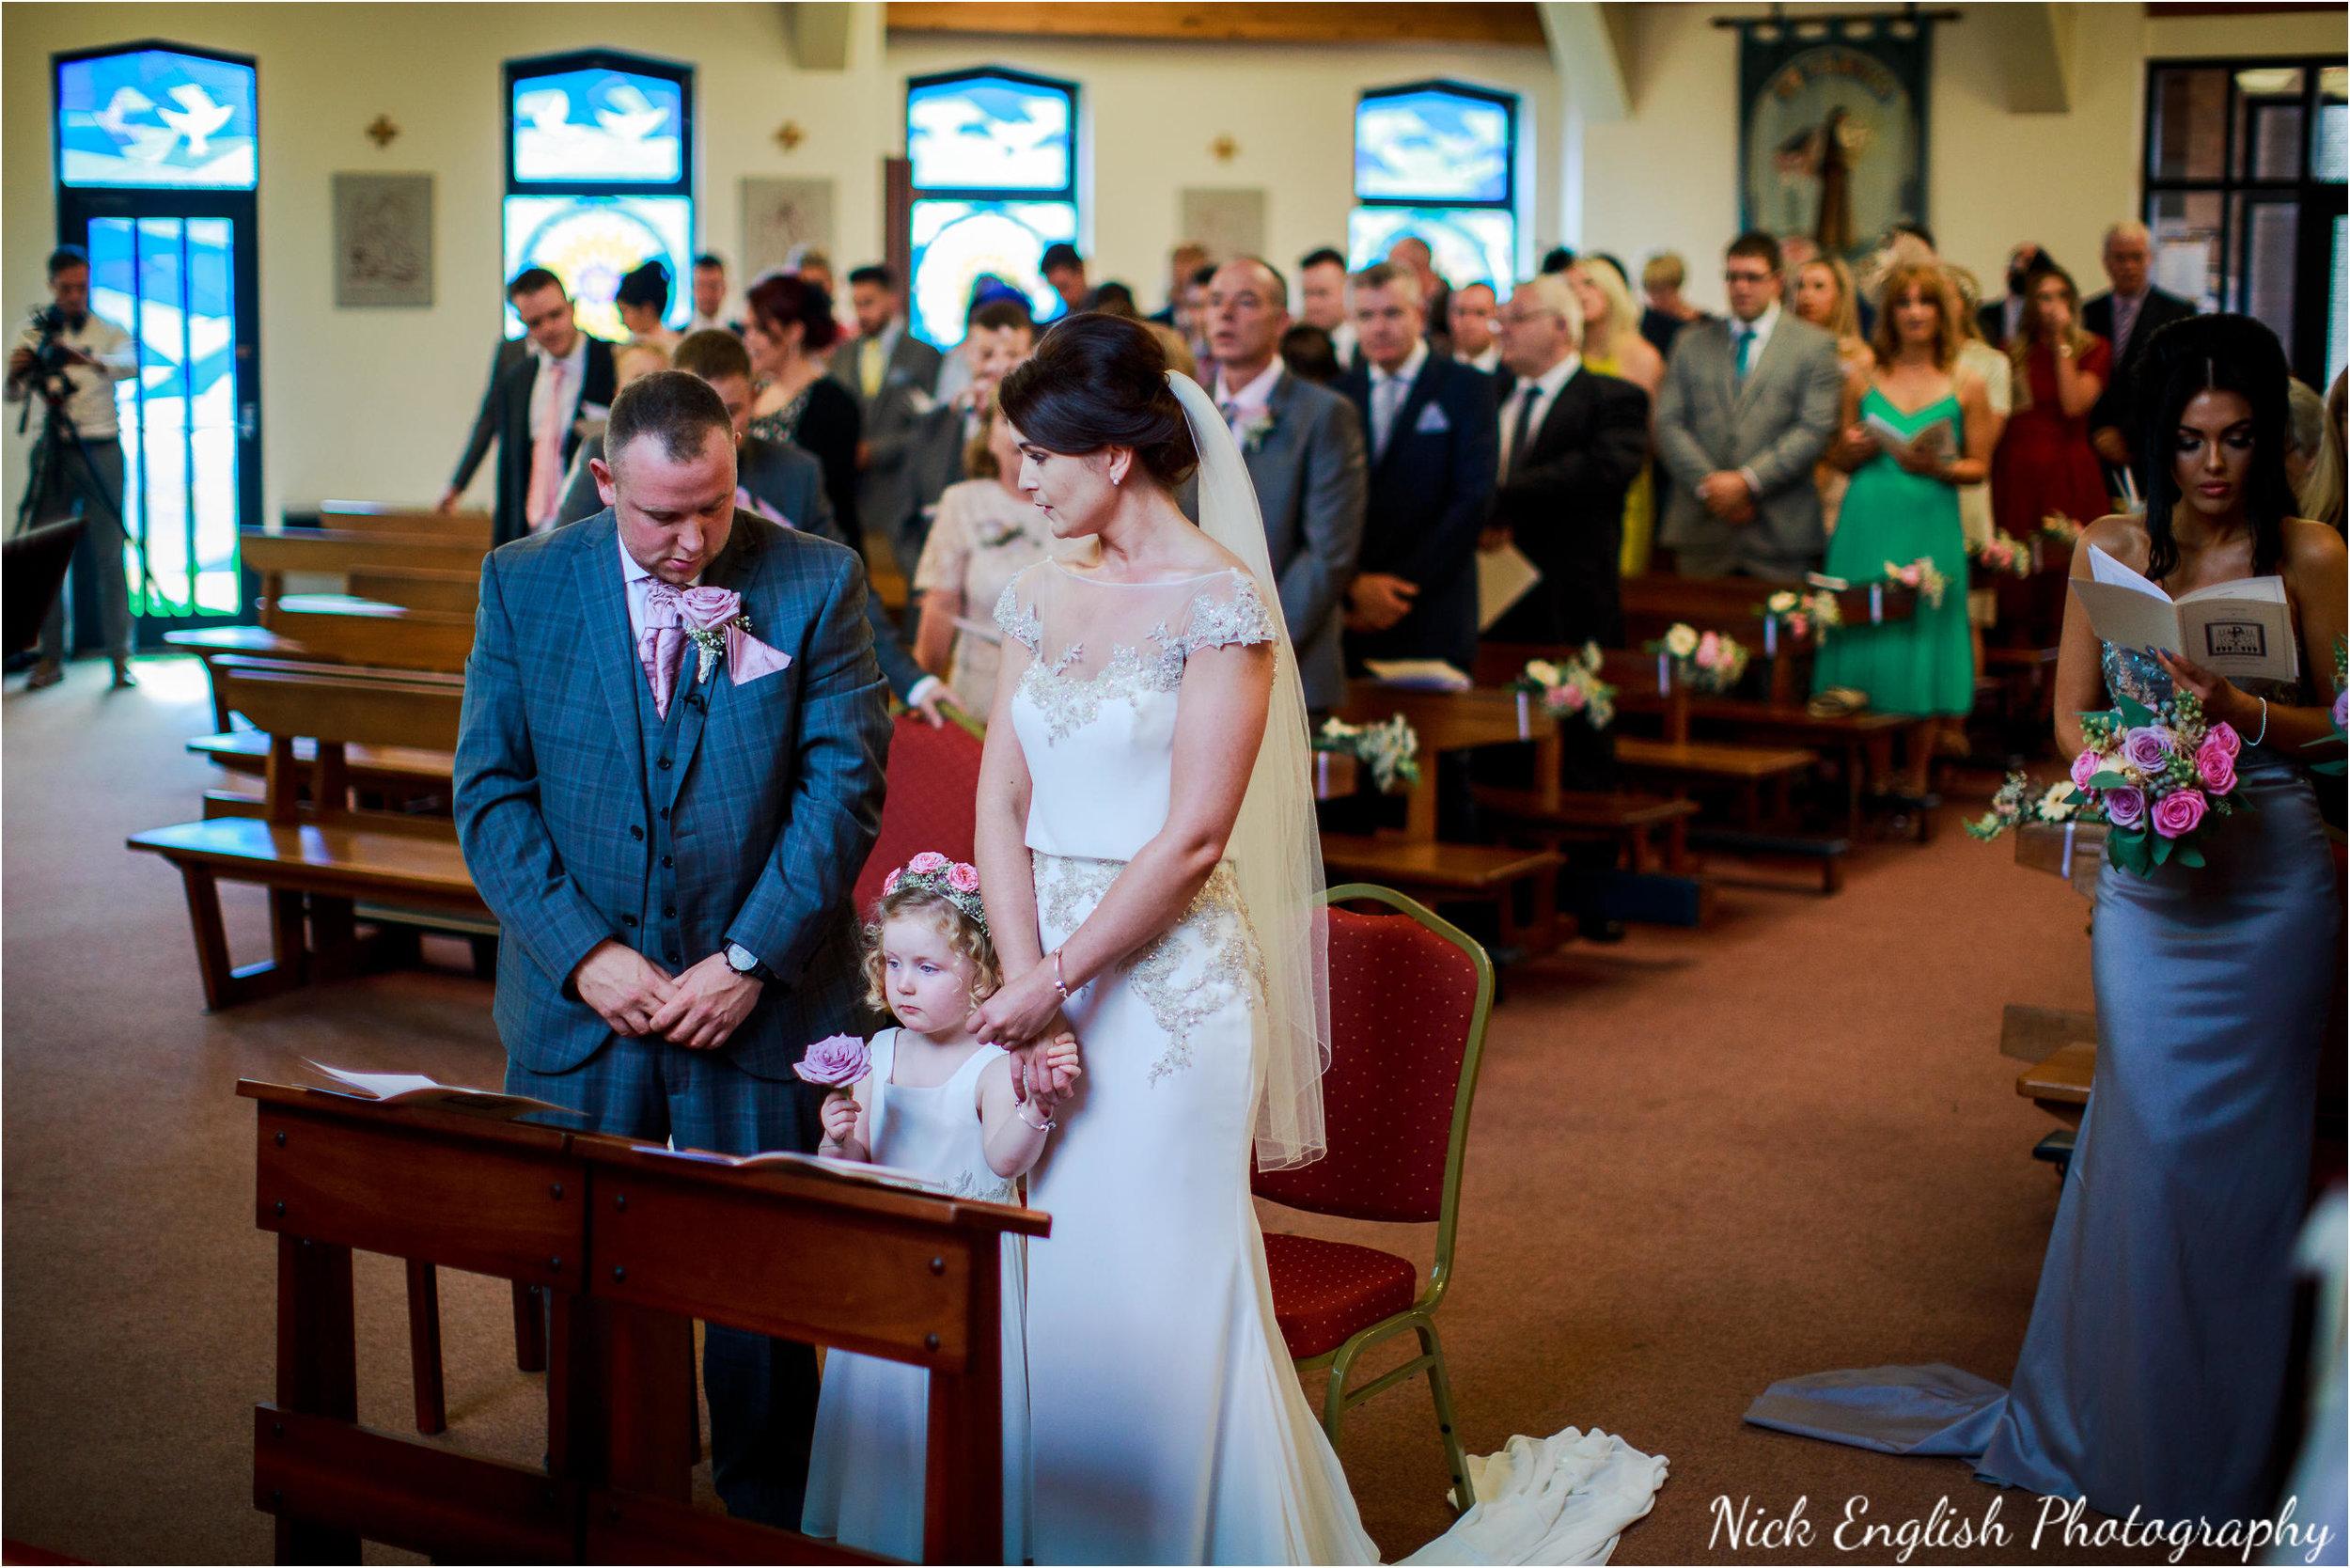 Stacey-Ash-Wedding-Photographs-Stanley-House-Preston-Lancashire-51.jpg